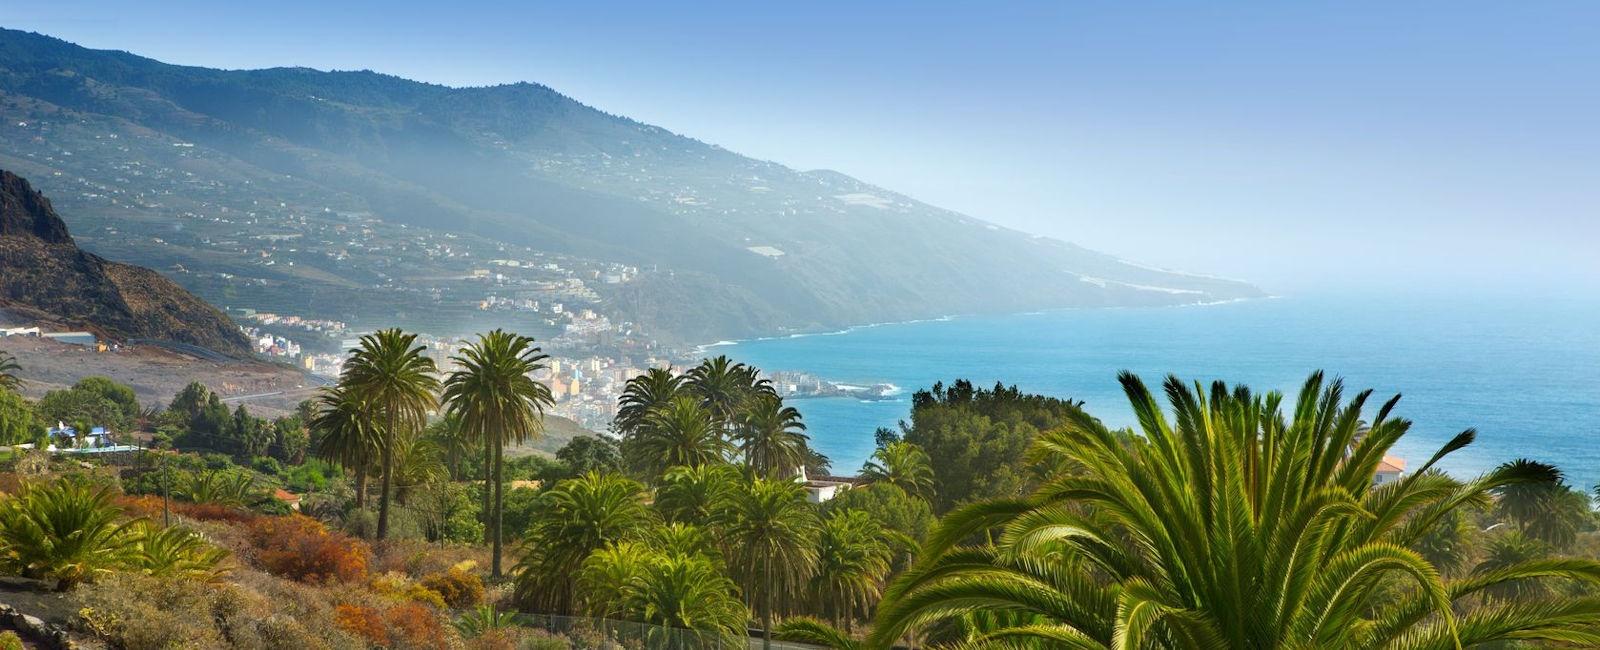 Luxury La Palma Holidays